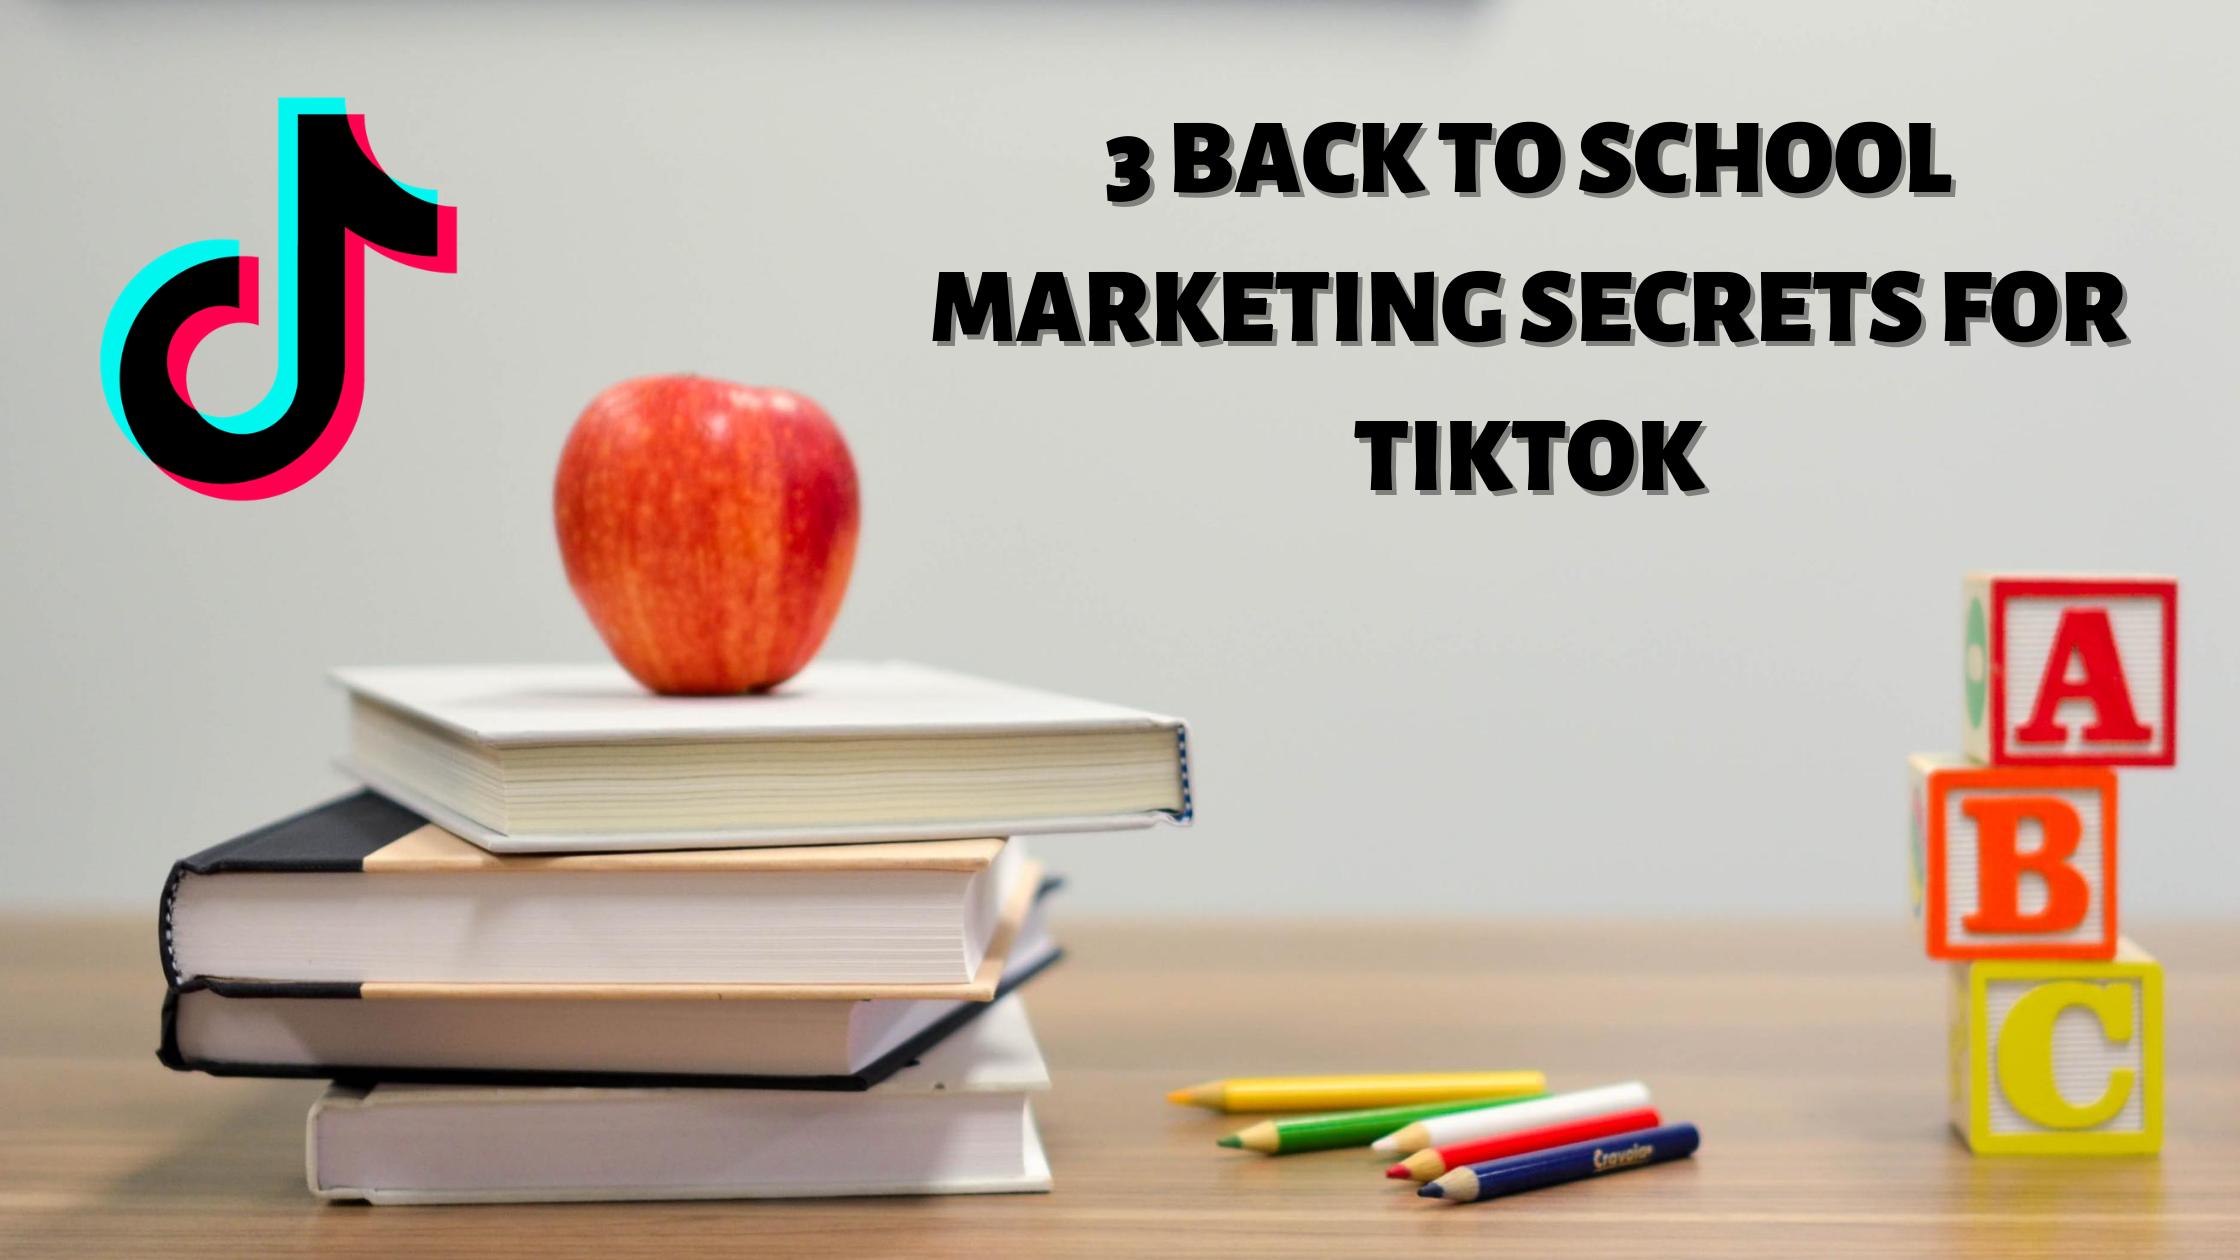 The 3 Secrets to Nailing Back To School Marketing on TikTok